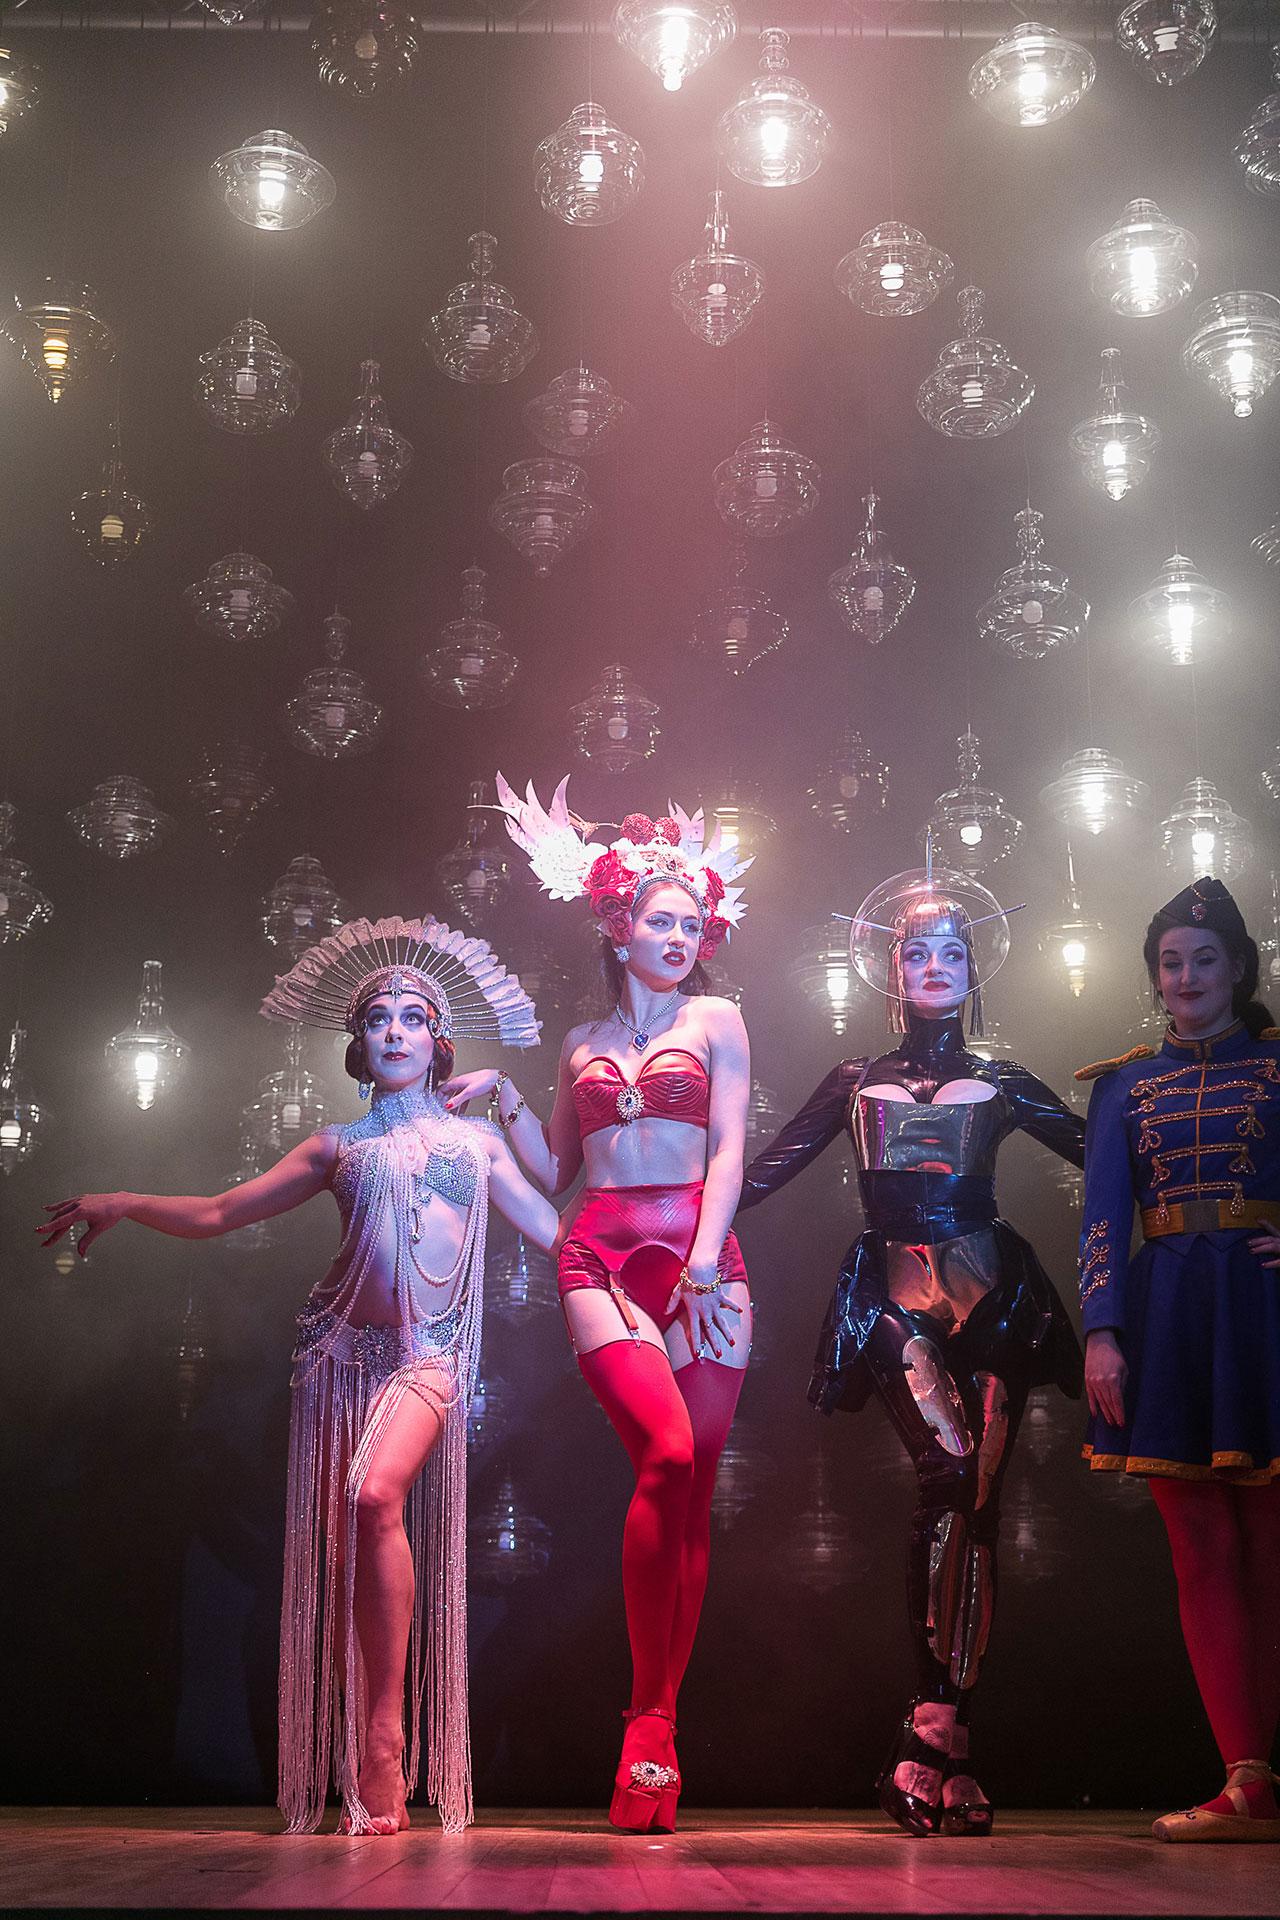 lasvit Monster Cabaret, A Phantasmagorical Show by Lasvit s4 lasvit monster cabaret milan teatro gerolamo yatzer